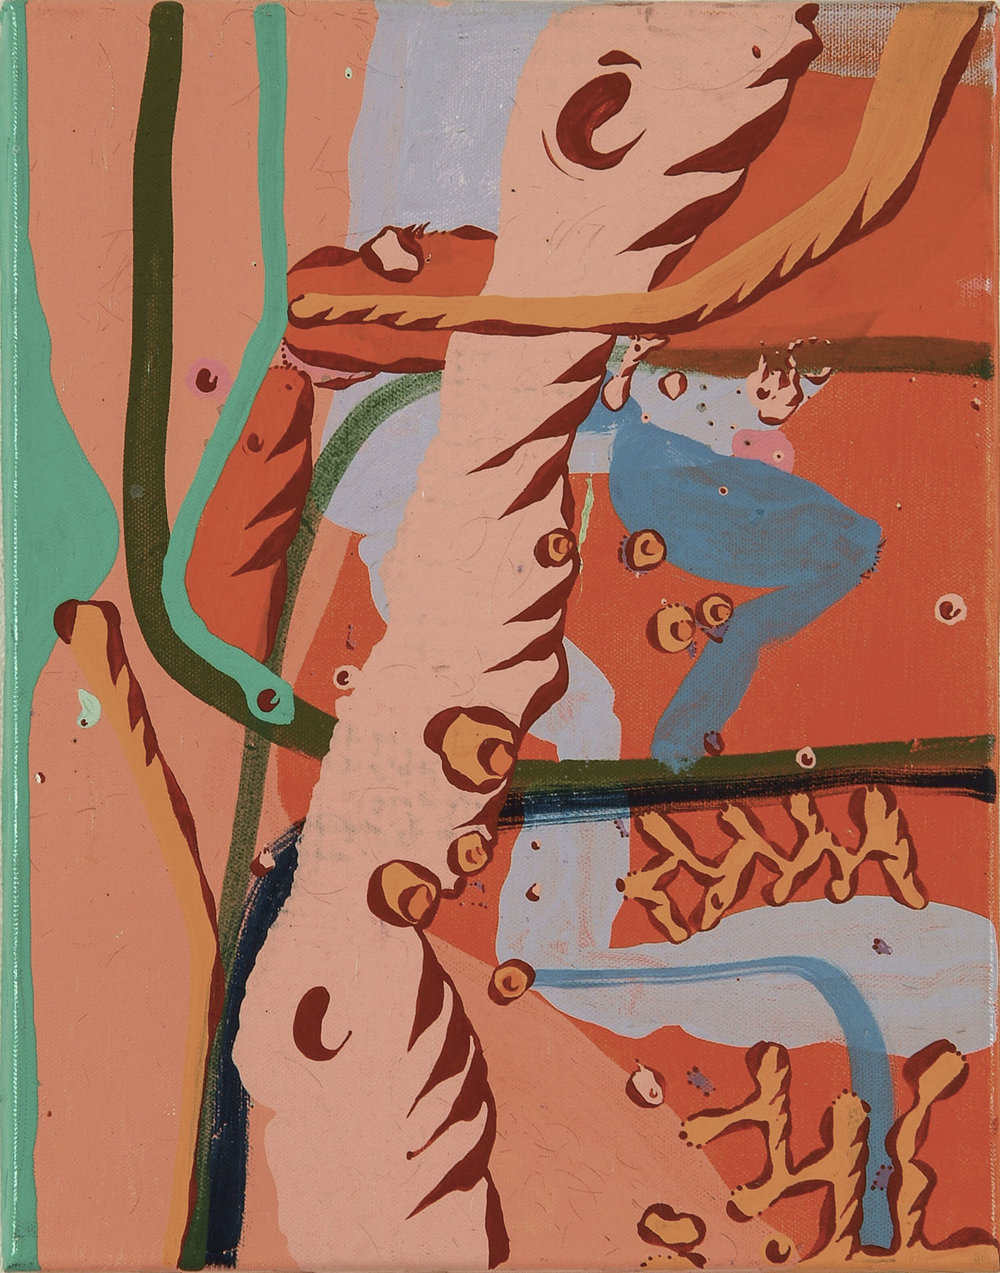 o.T. | Acryl auf Leinwand |2005 |35,5 x 28 cm